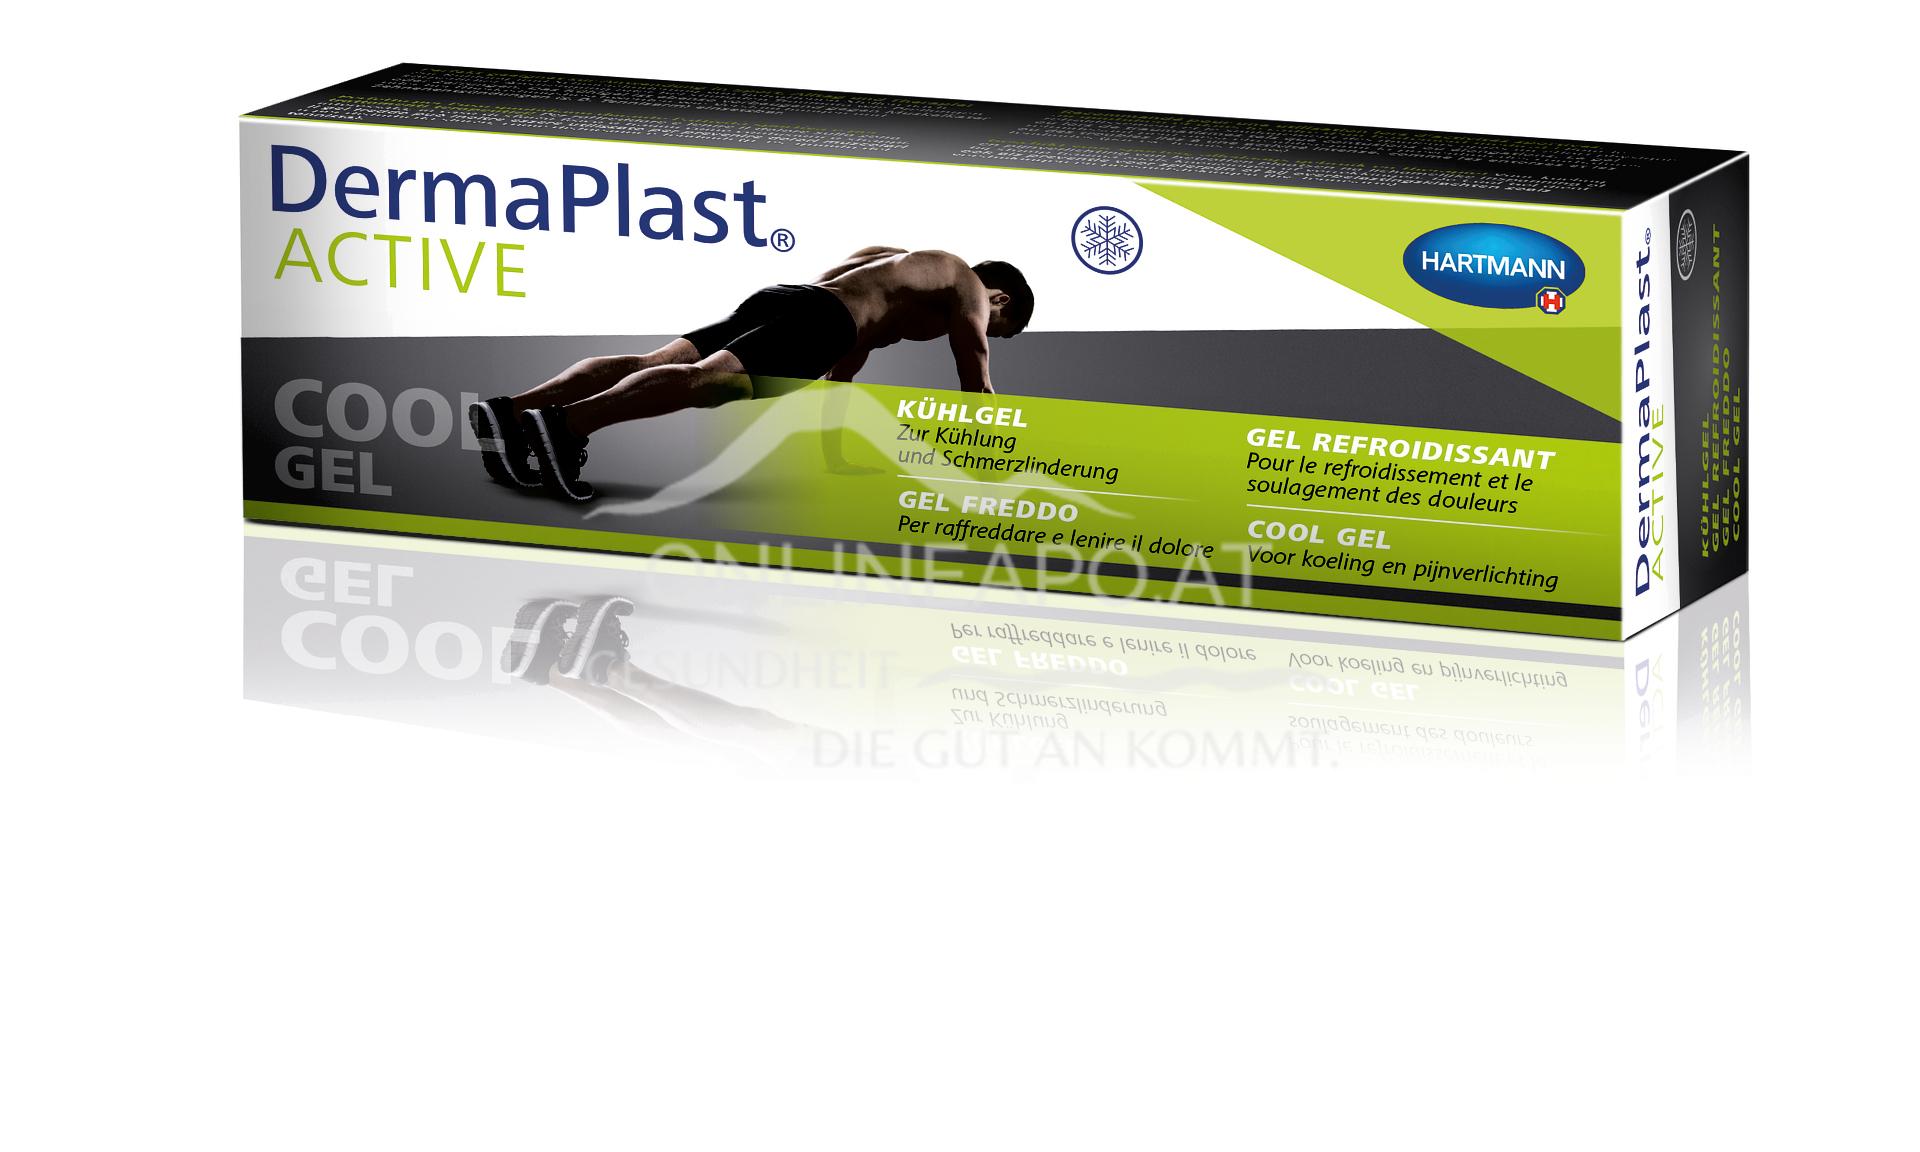 DermaPlast® ACTIVE Cool Gel, Kühlgel